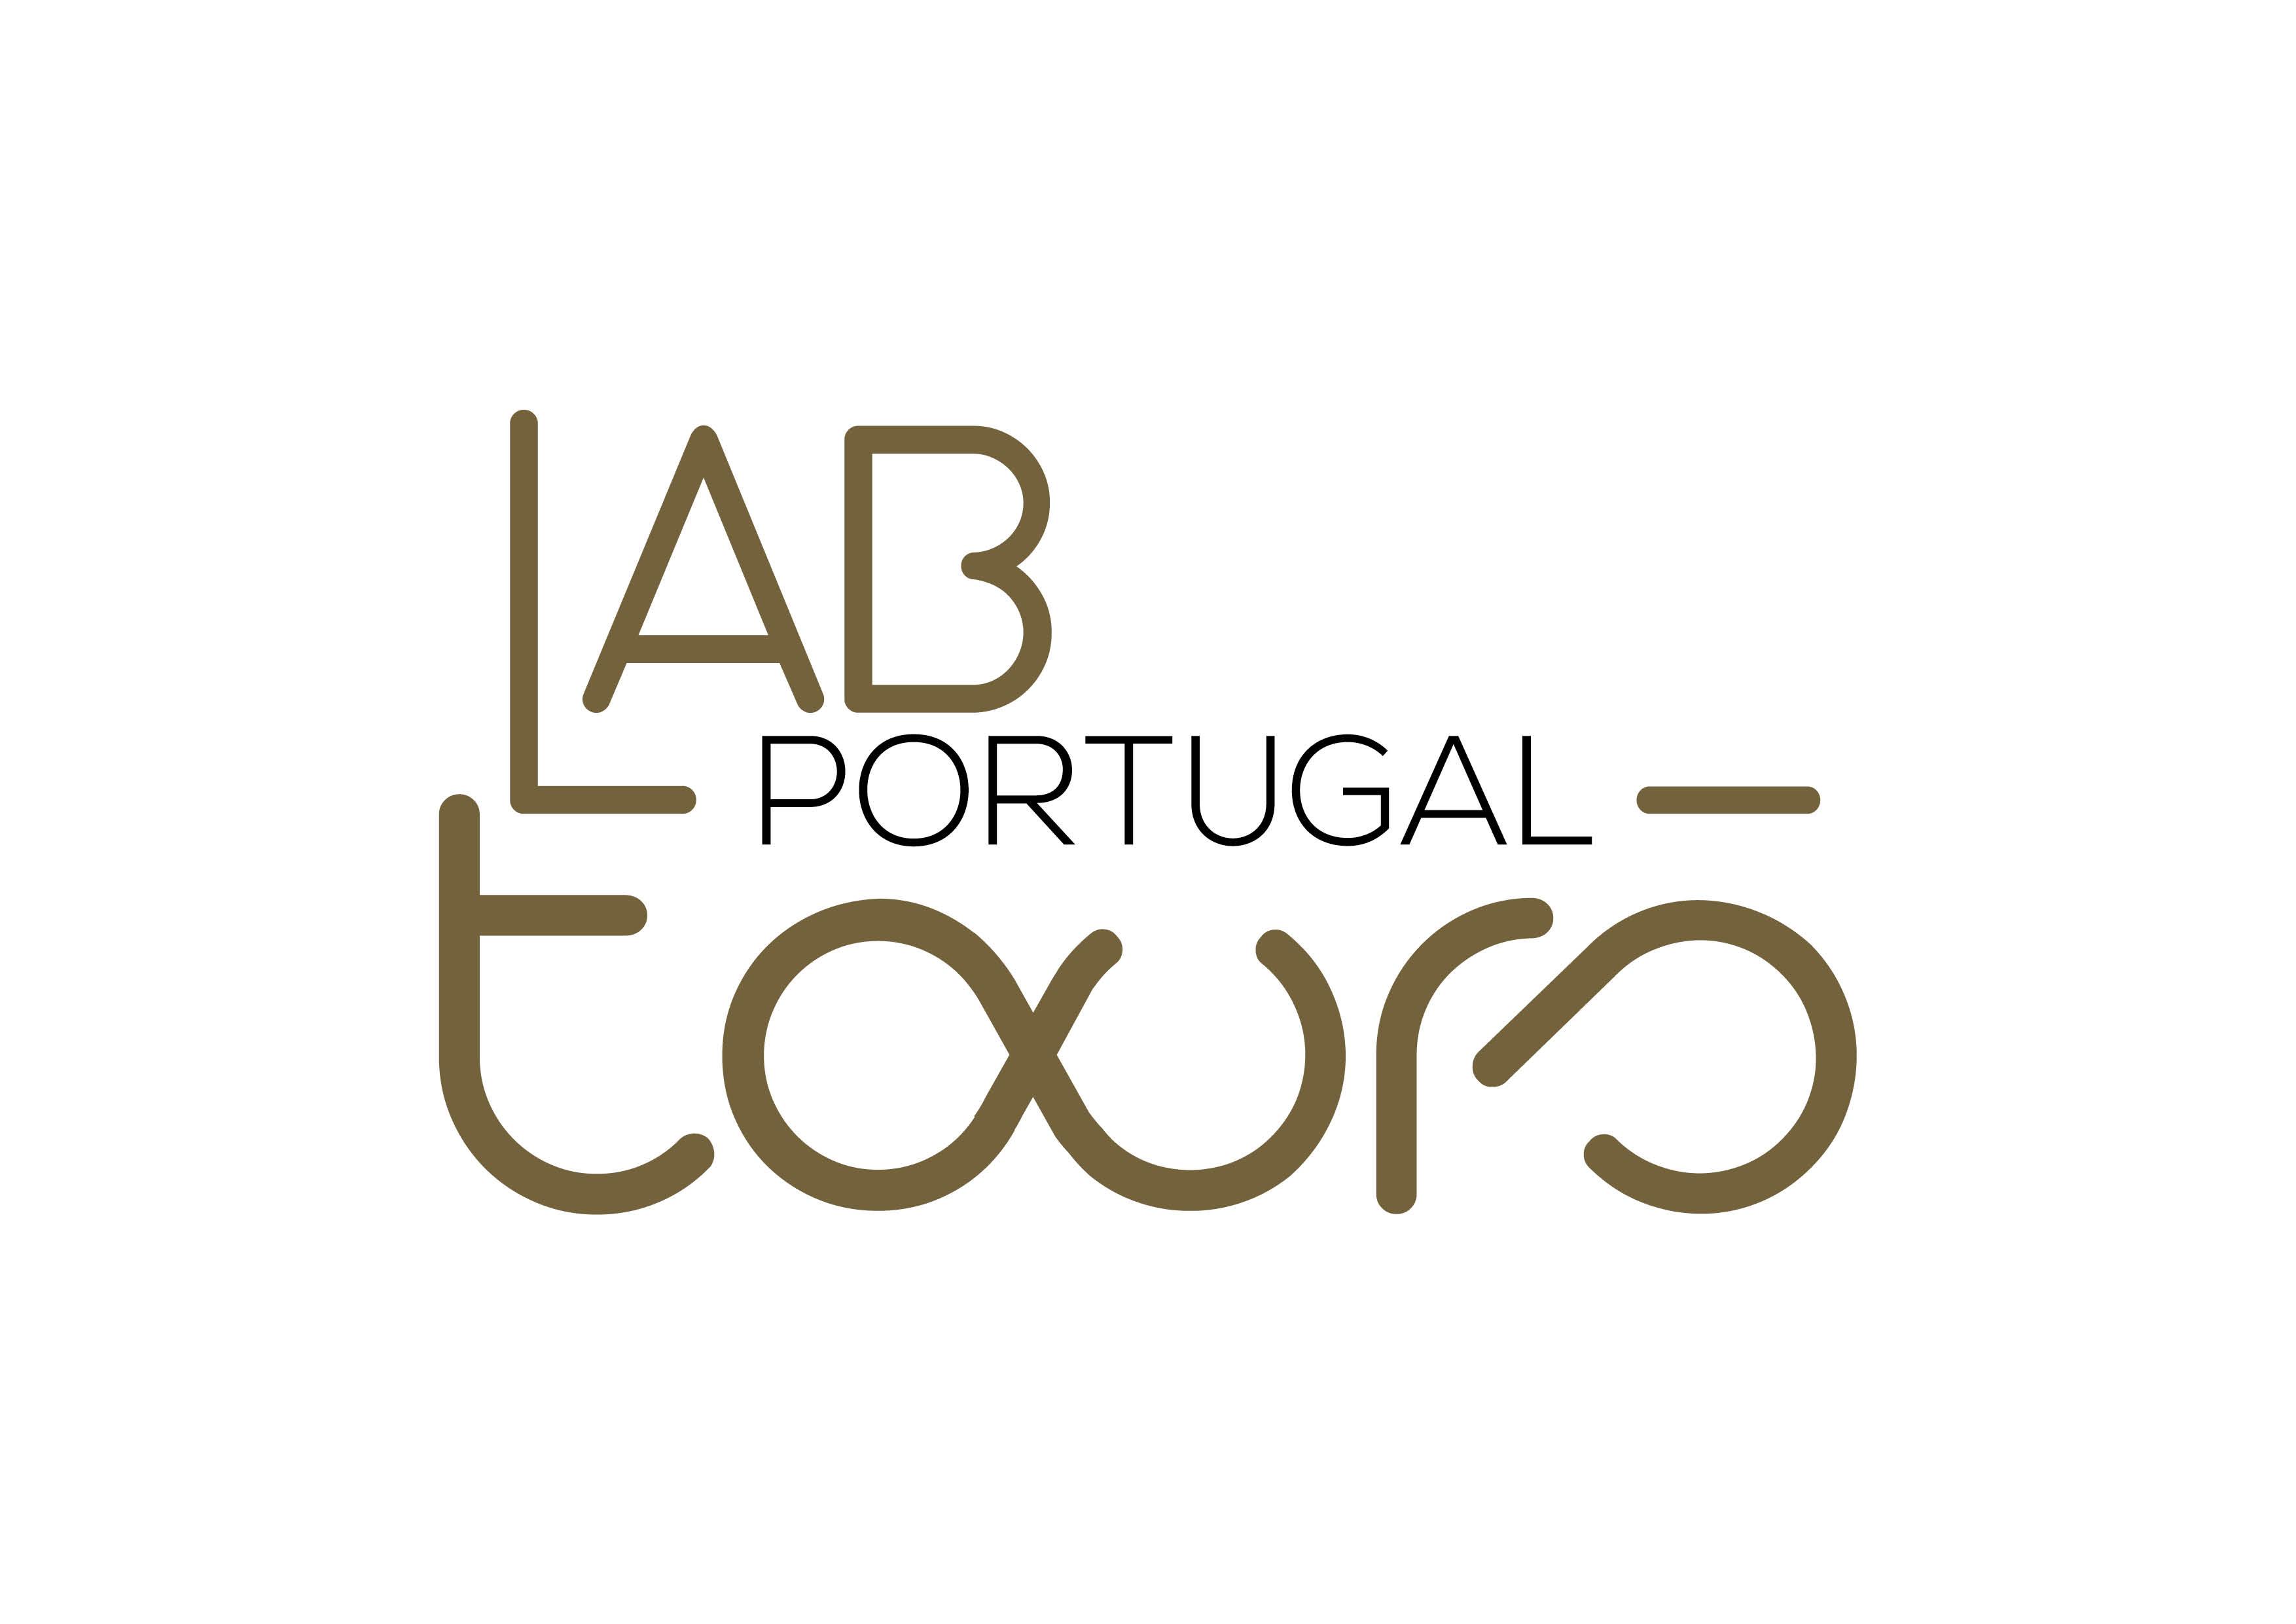 Lab Portugal Tours